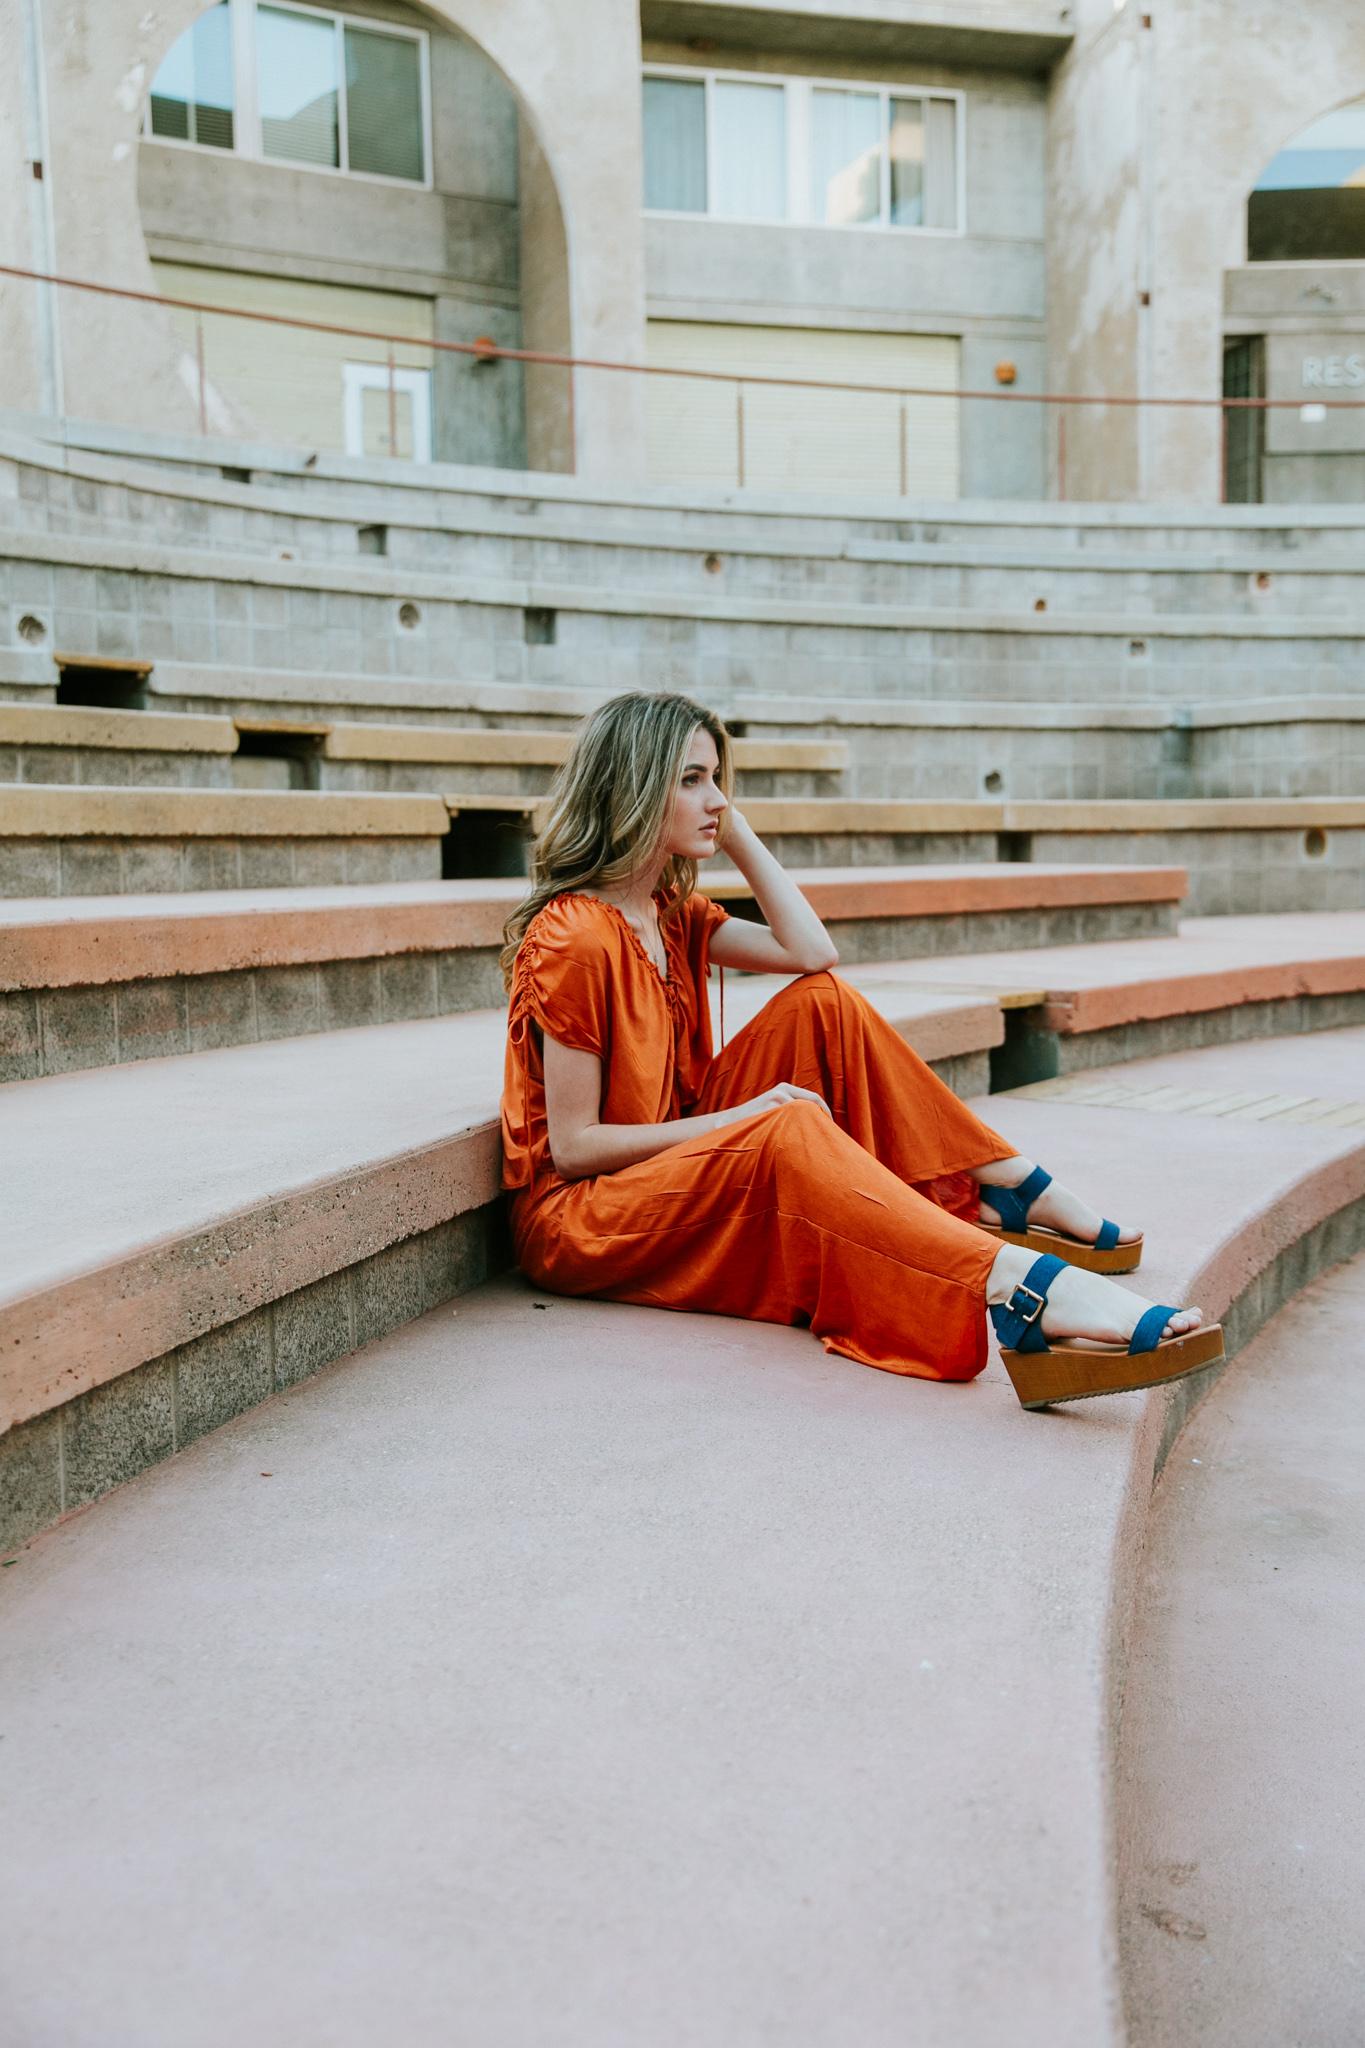 ChelseaScottEvans-Arcosanti-062.jpg